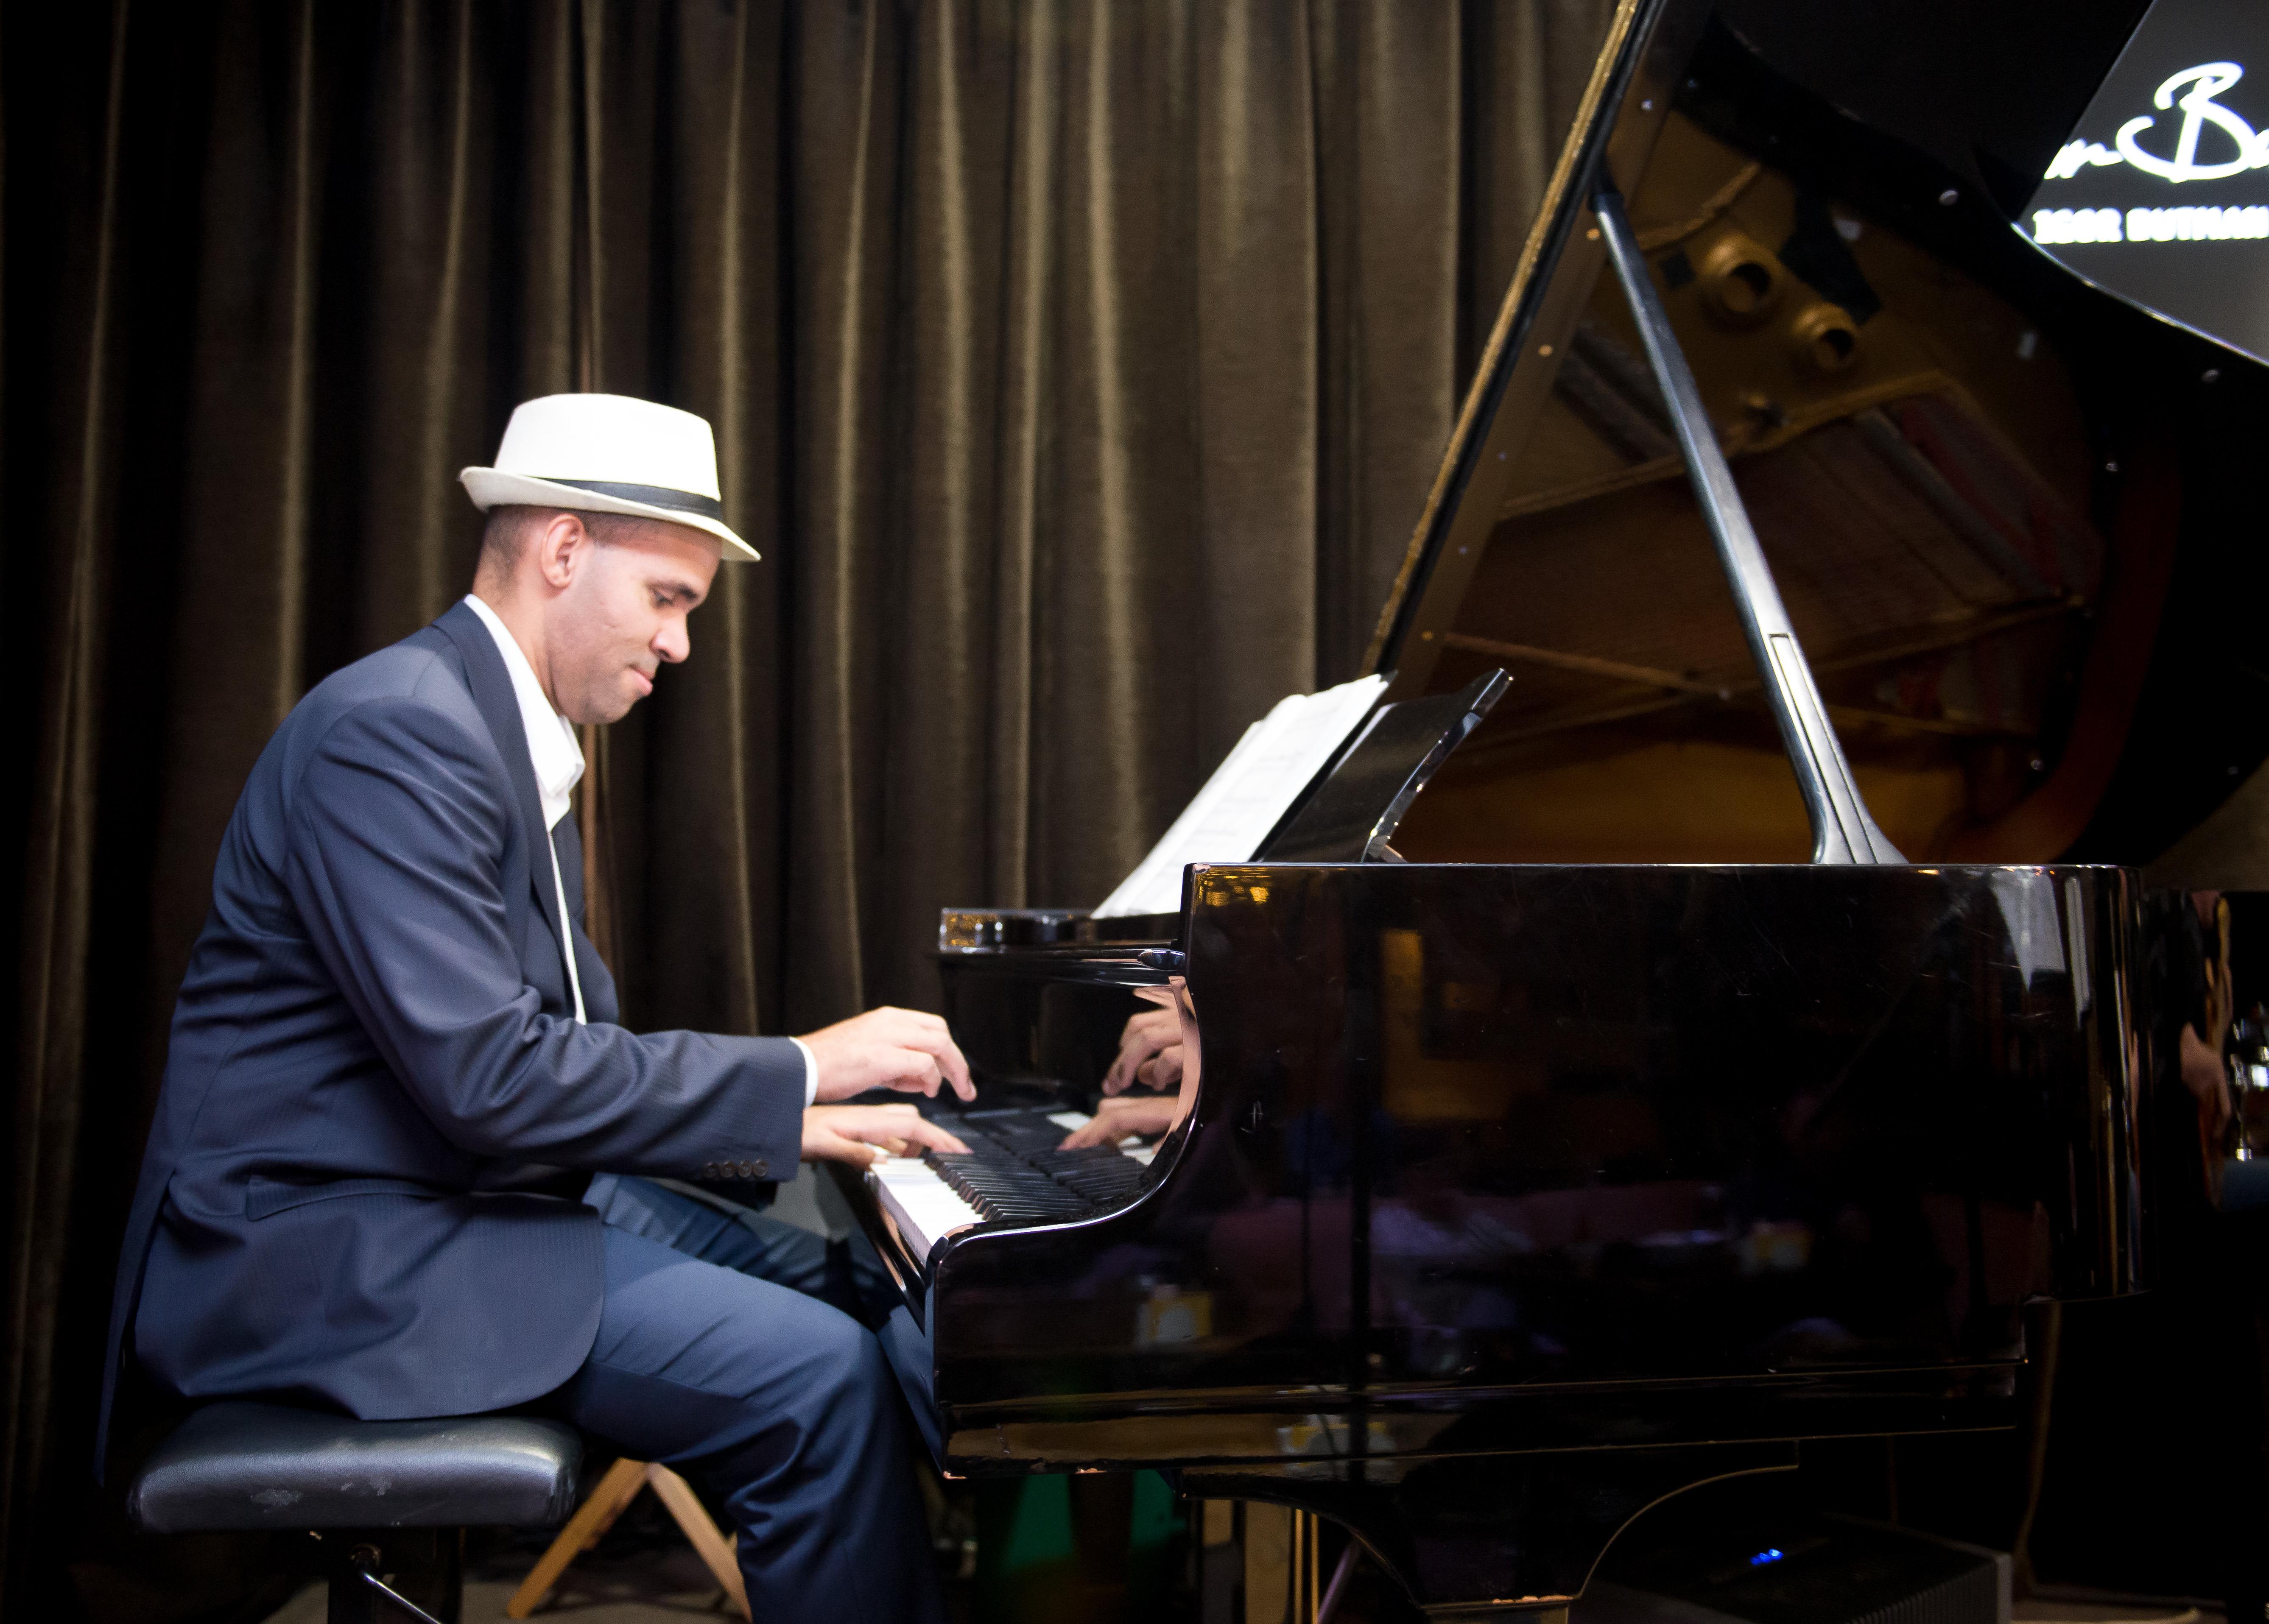 Pianist, composer, arranger